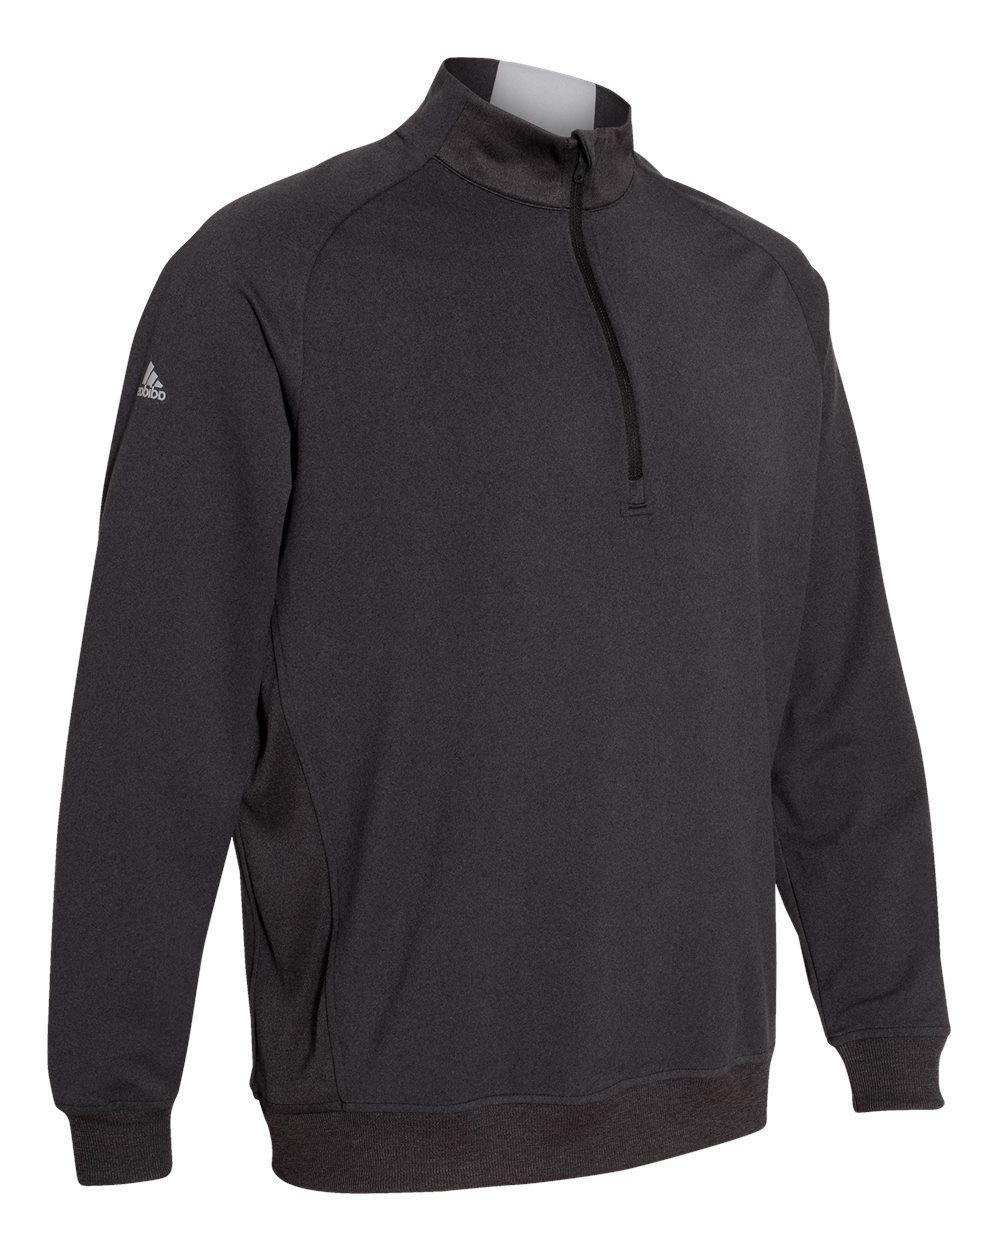 Adidas - Golf Vest Sizes S-3XL, UPF 50+, A270,